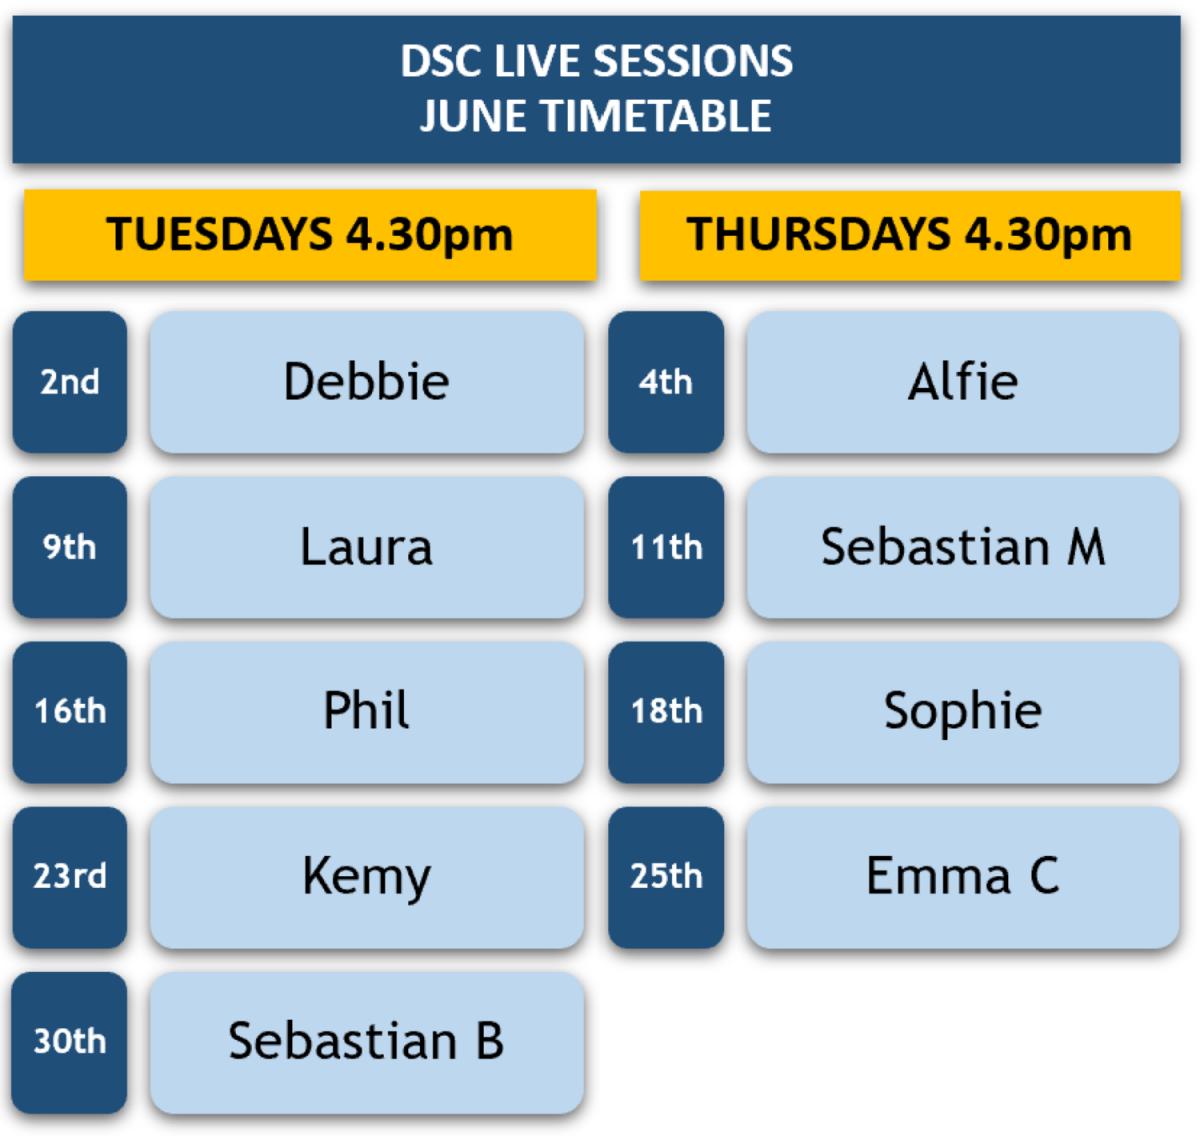 DSC Live Sessions Timetable